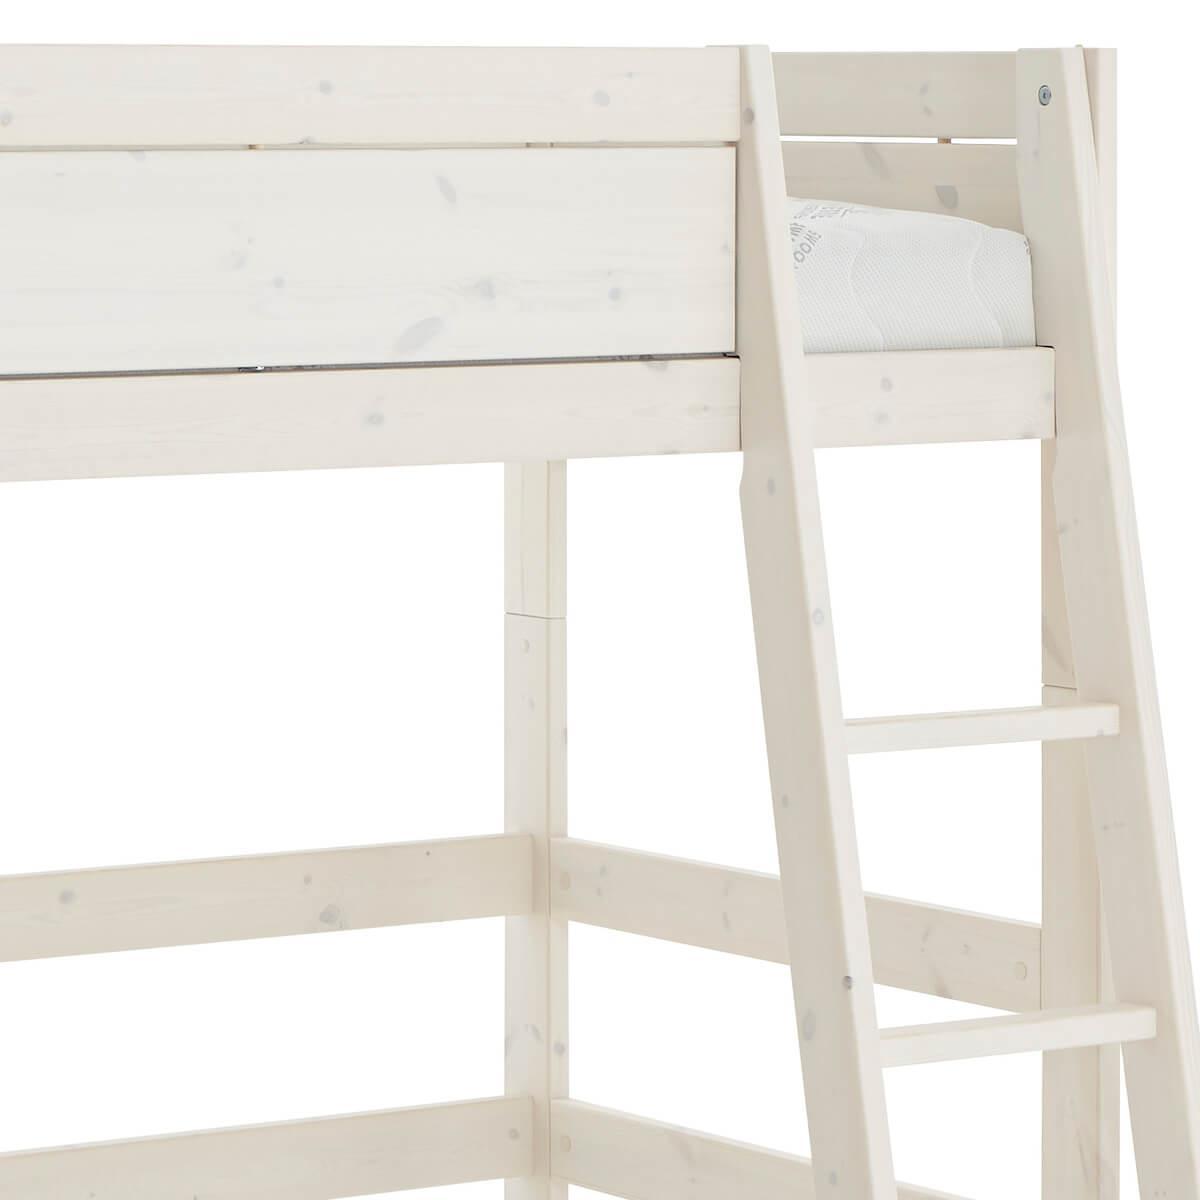 Cama semi alta 90x200cm escalera inclinada Lifetime blanqueado